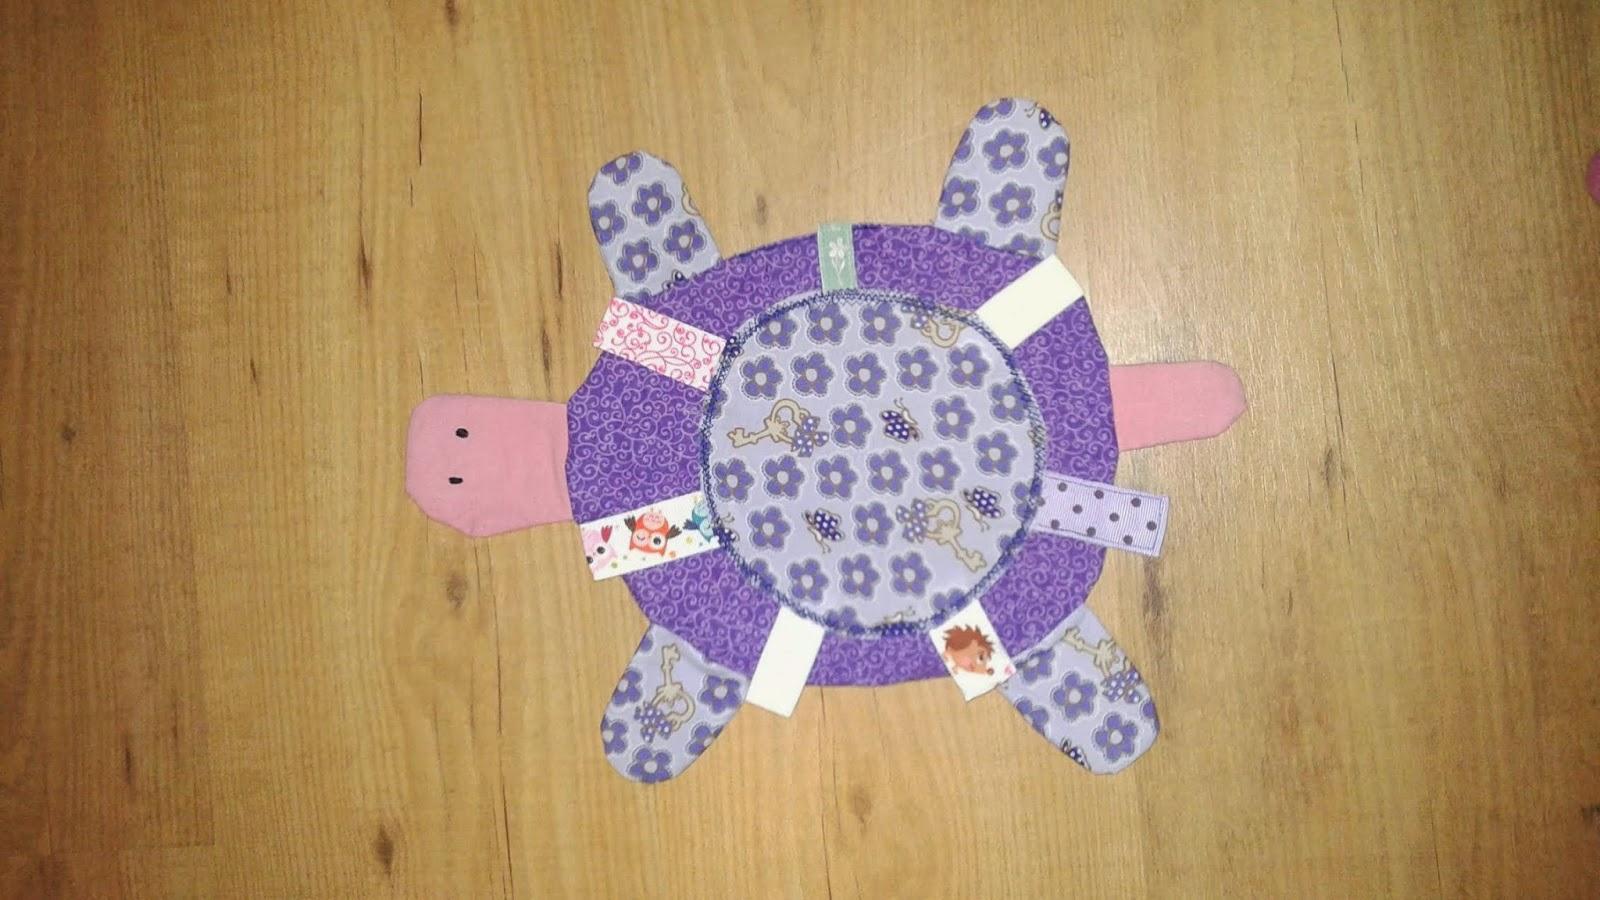 sy sköldpadda leksak baby barn present mönster